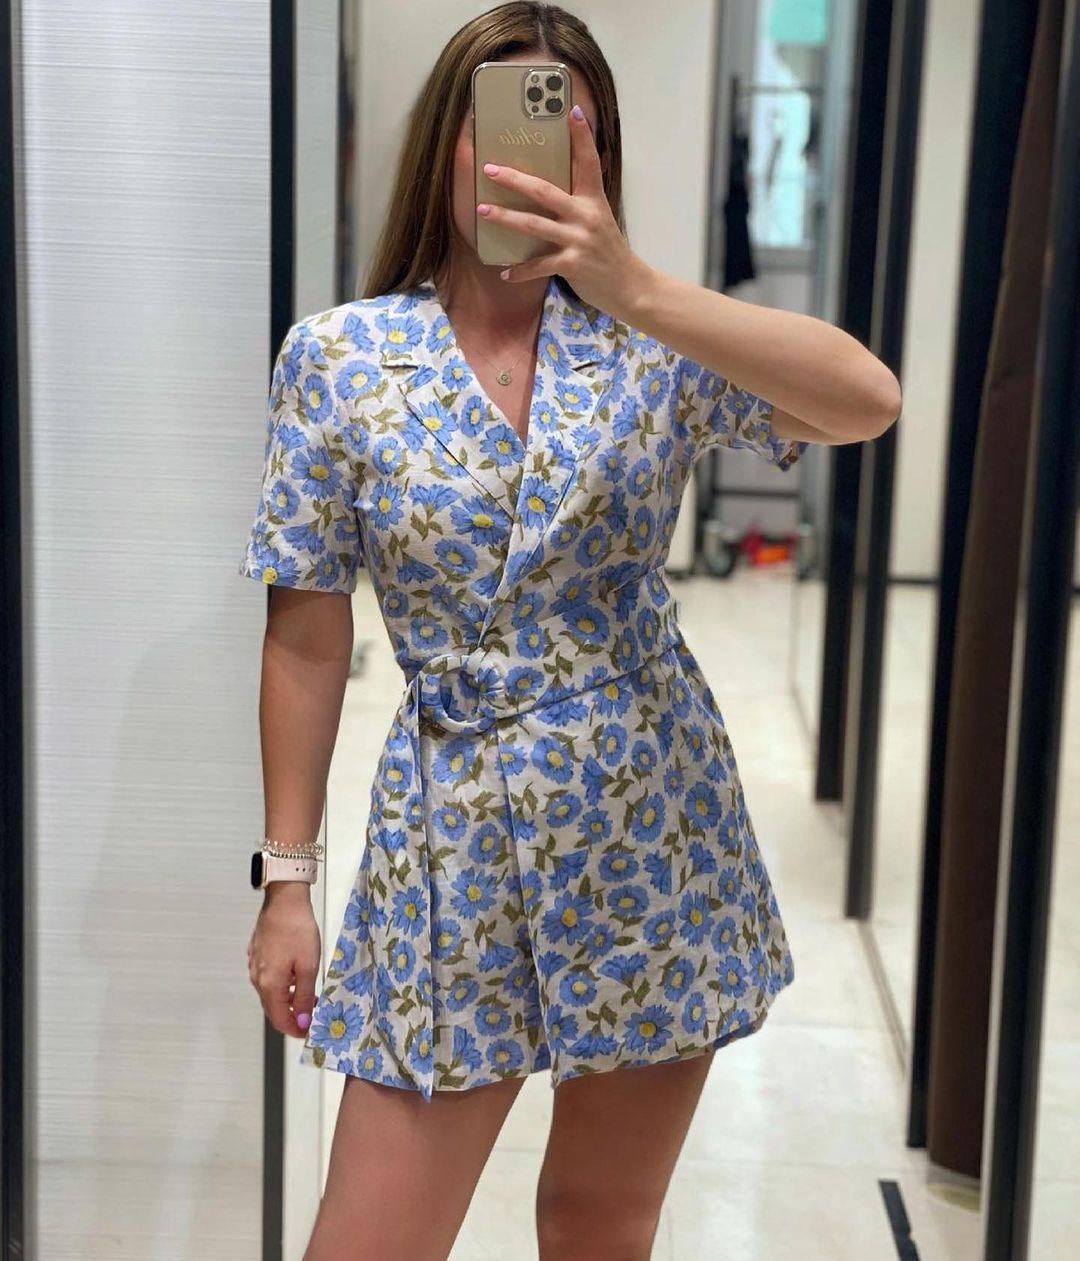 floral print jumpsuit de Zara sur zaradiccion__